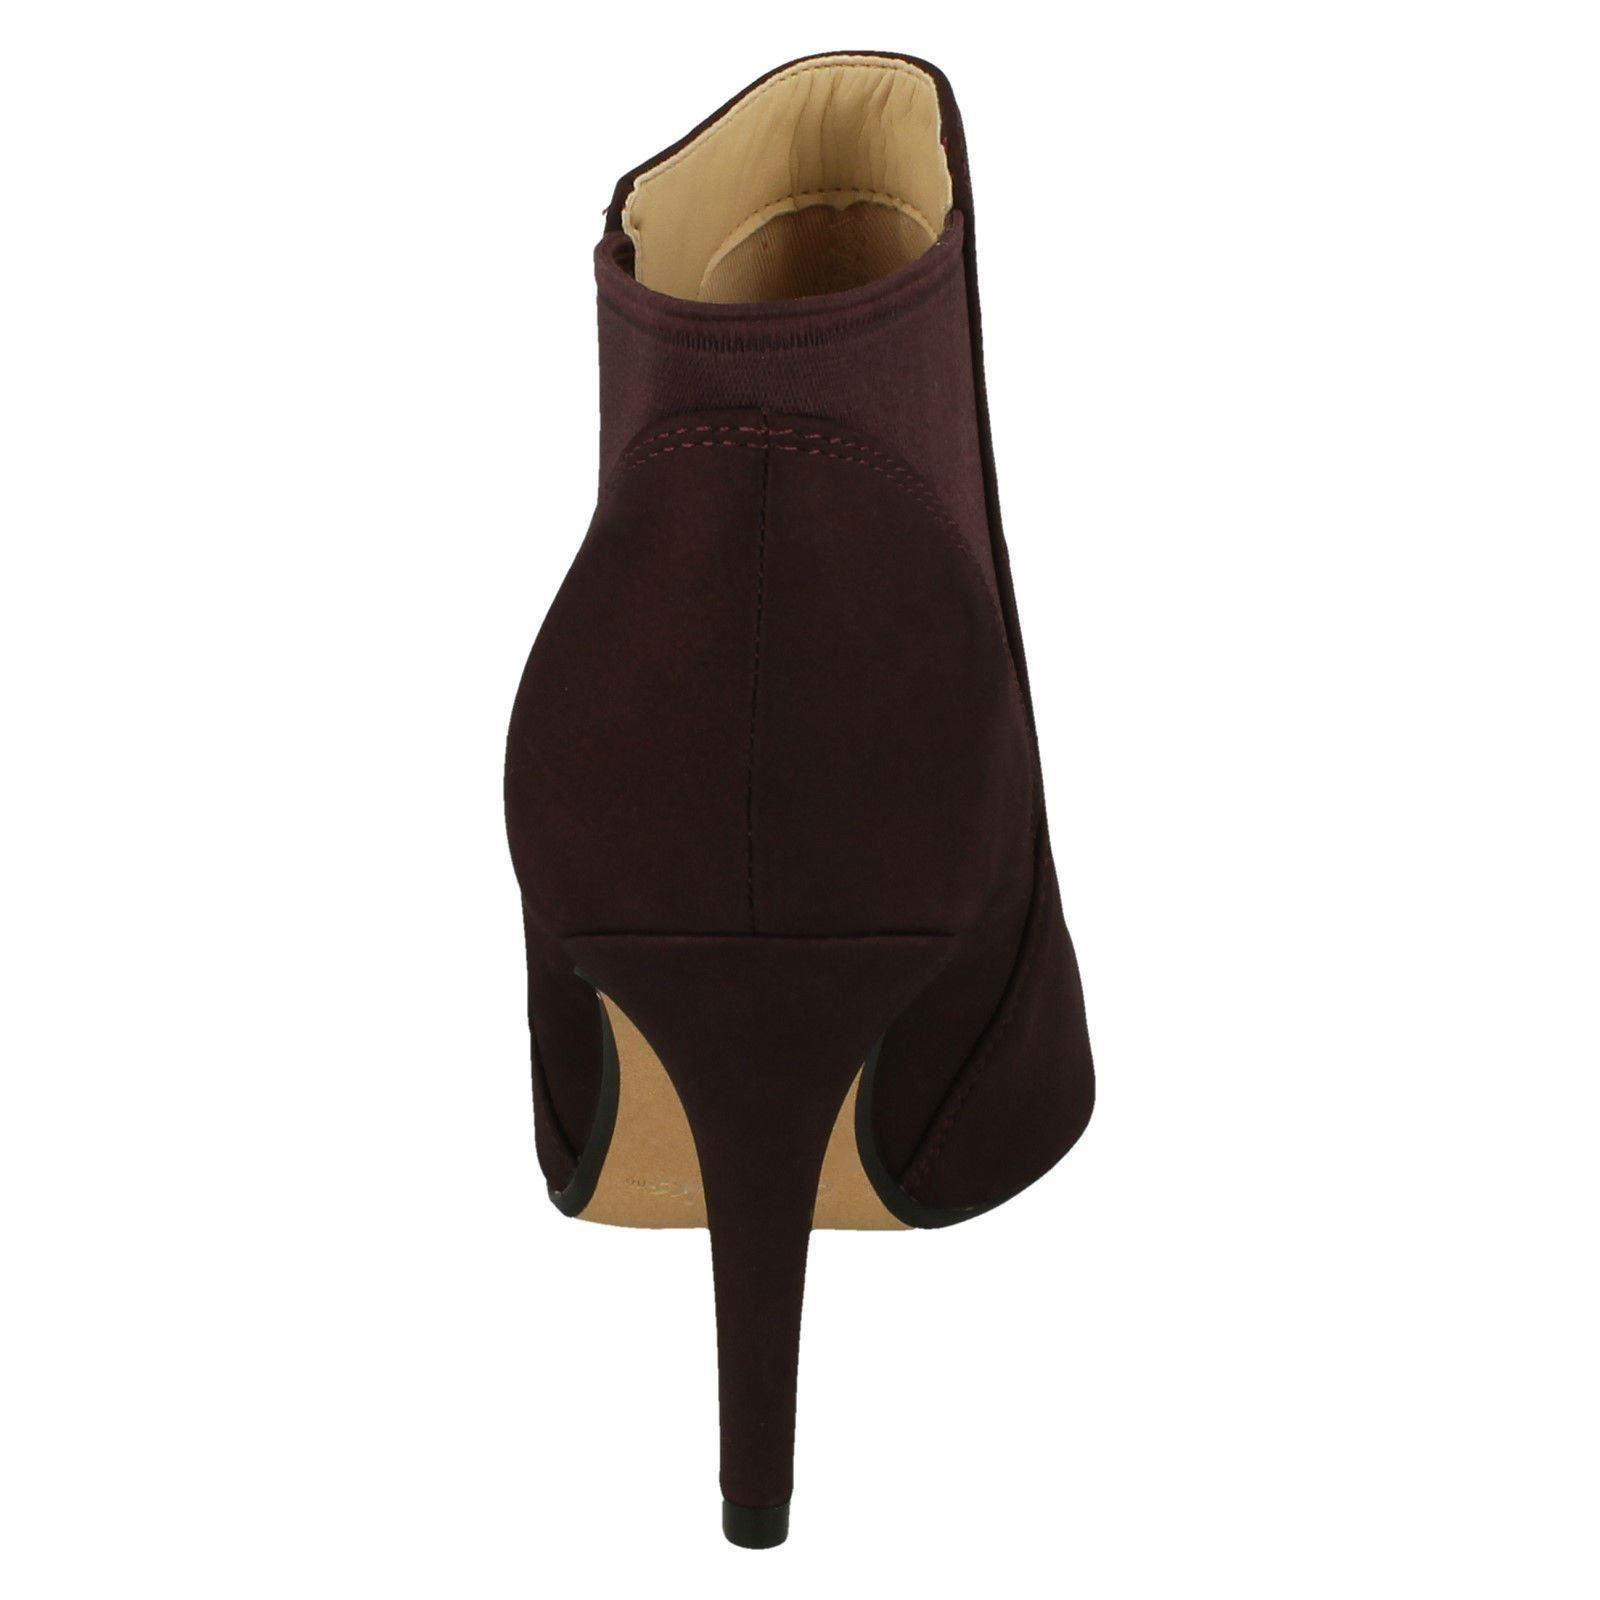 ba461c95 Mujer-Clarks-pull-Botines-Laina-Violeta miniatura 5